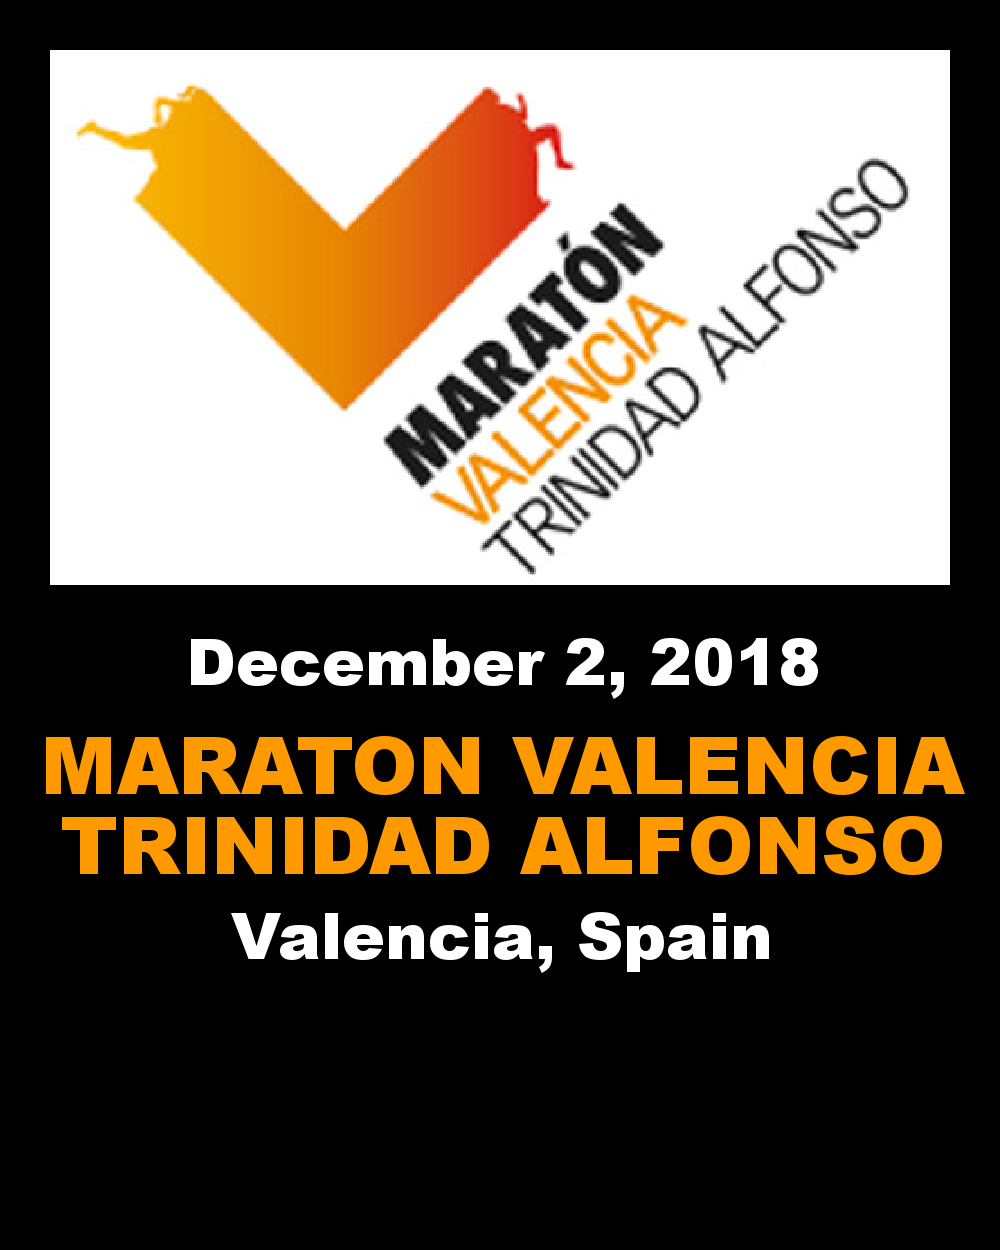 MARATÓN VALENCIA TRINIDAD ALFONSO EDP 2018